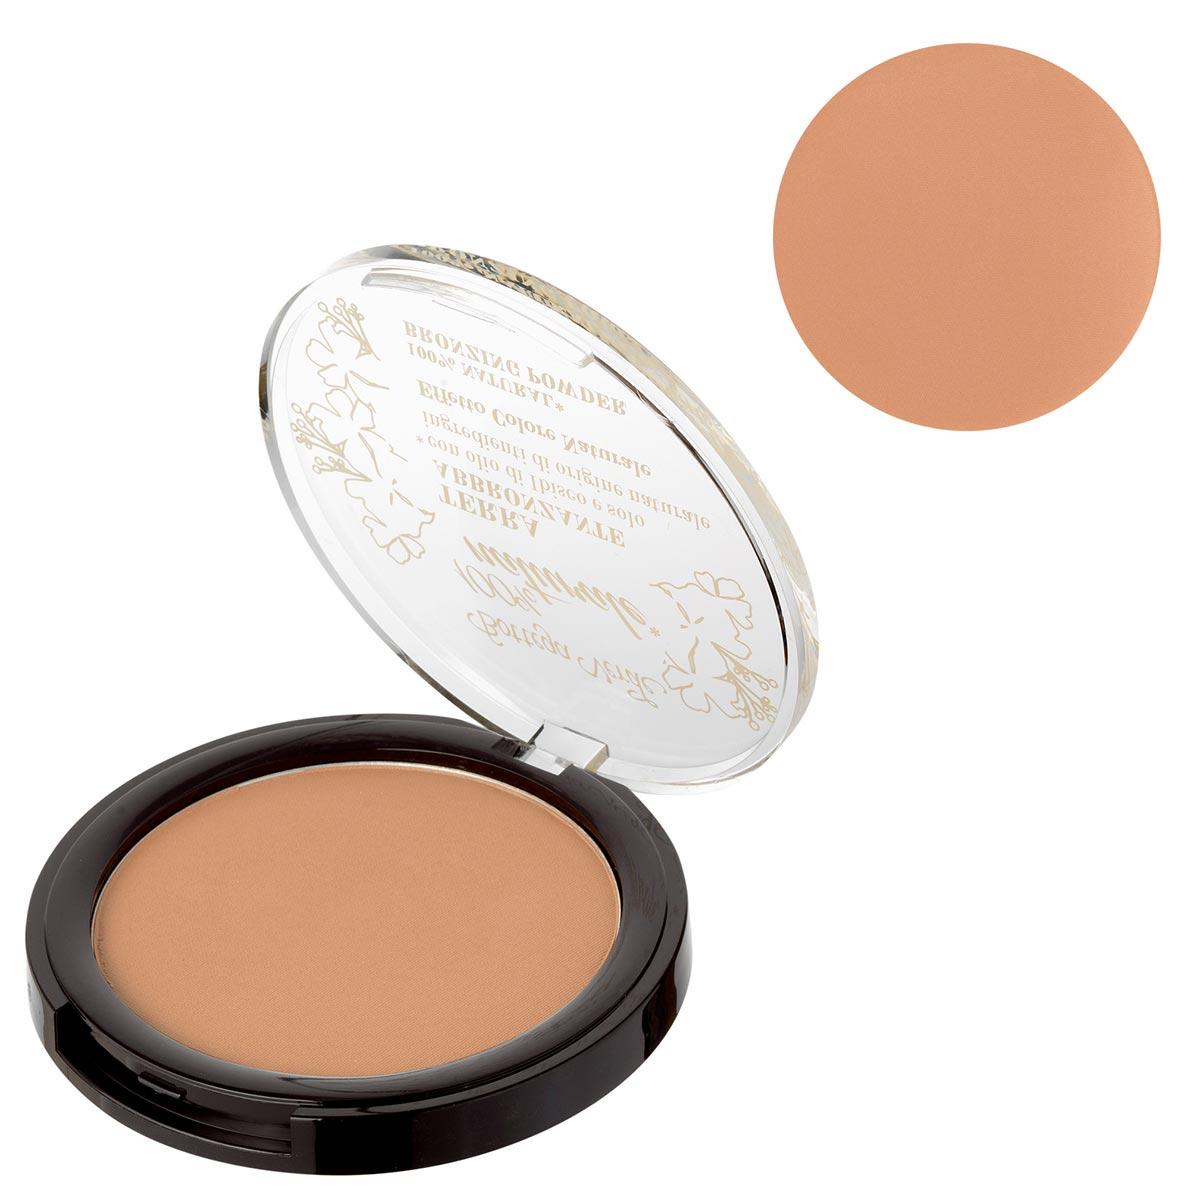 Pudra compacta bronzanta cu extract de ulei de hibiscus si ingrediente naturale, bej inchis - 100% natural